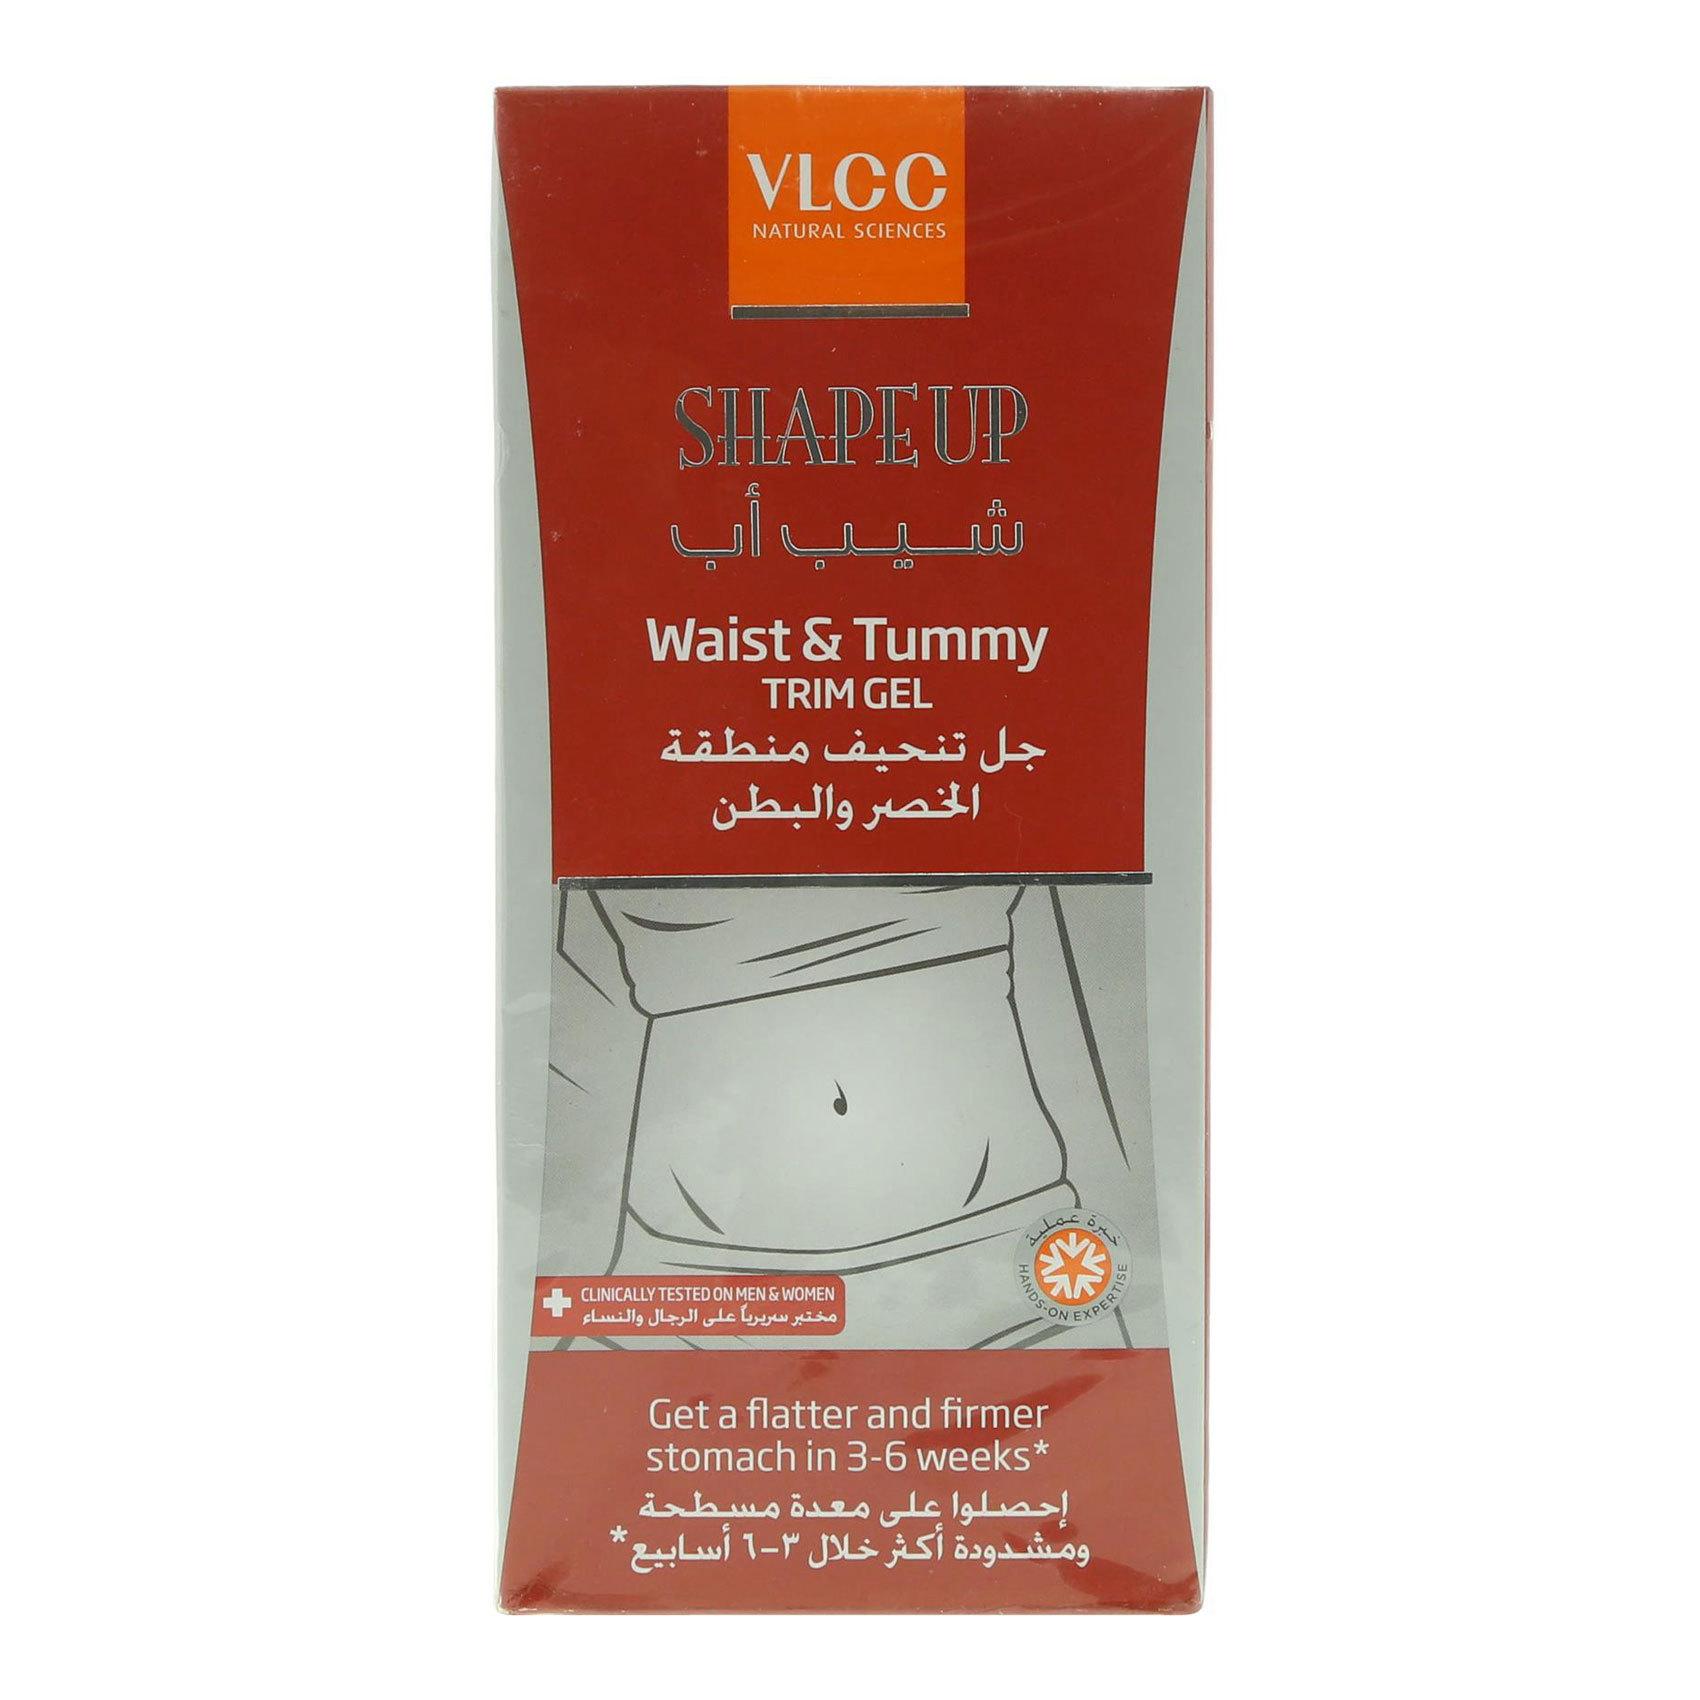 VLCC WAIST & TUMMY TRIM GEL 200ML